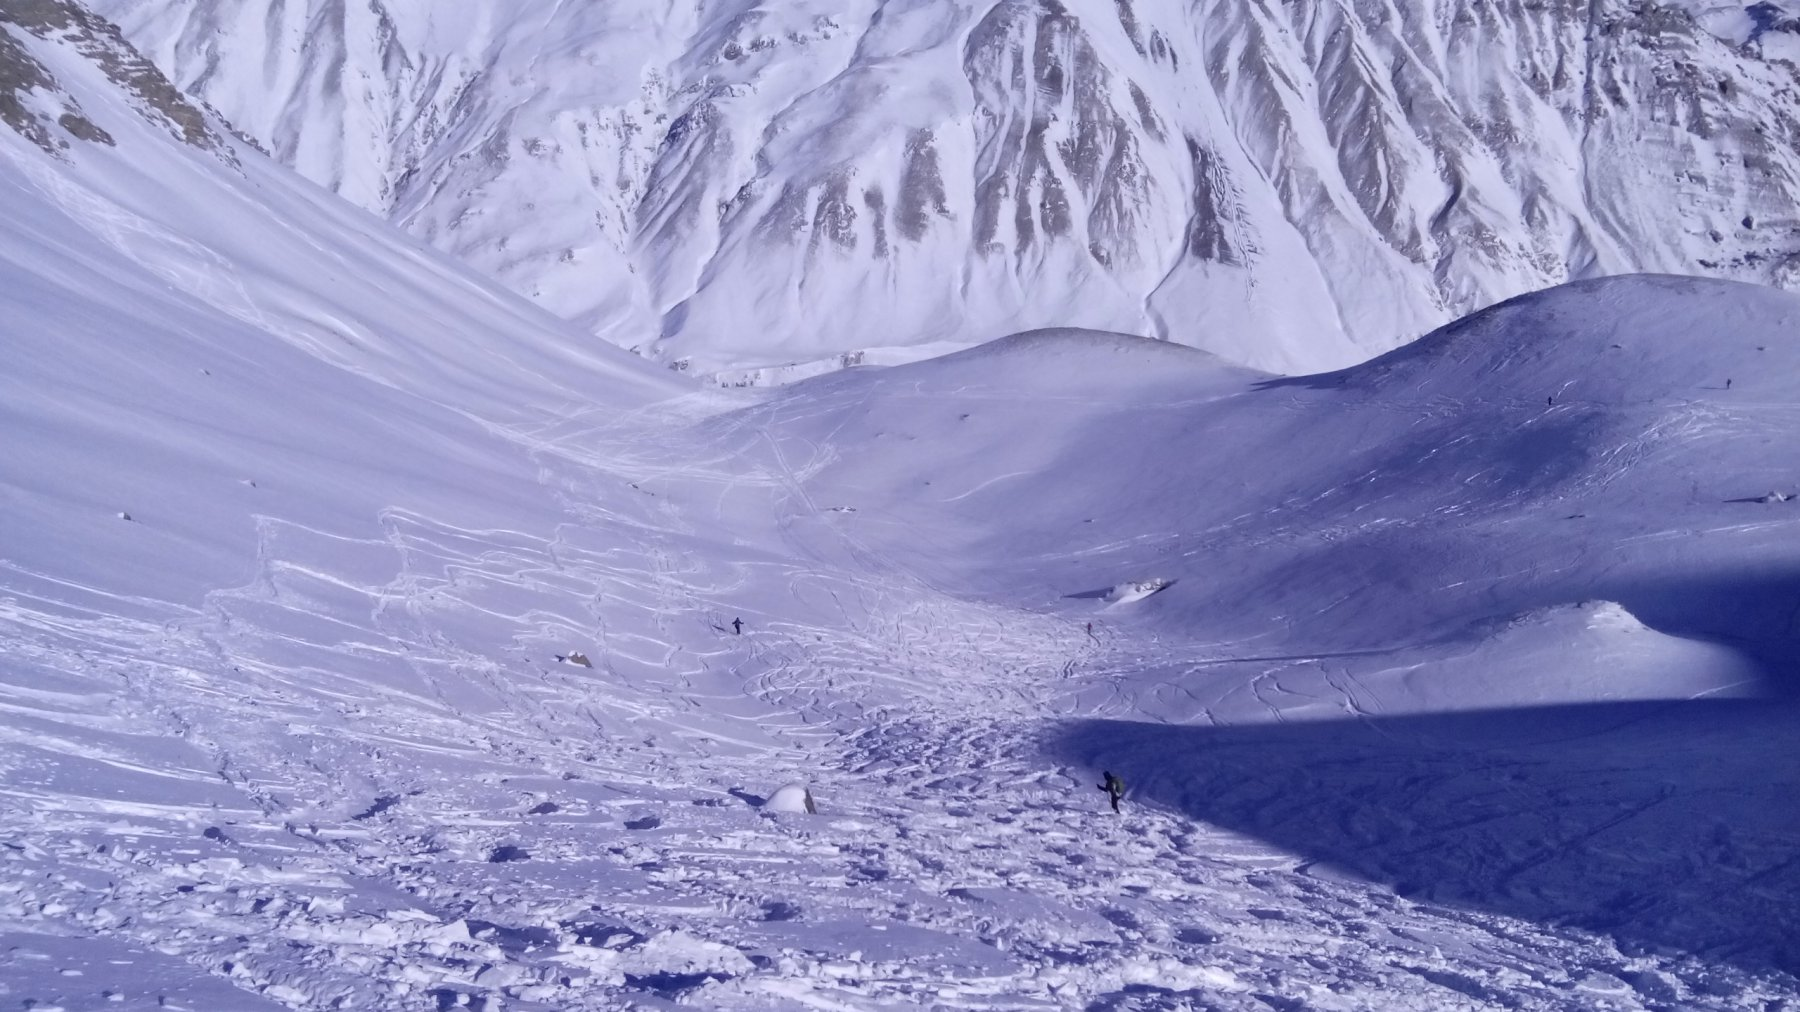 02 - bella neve